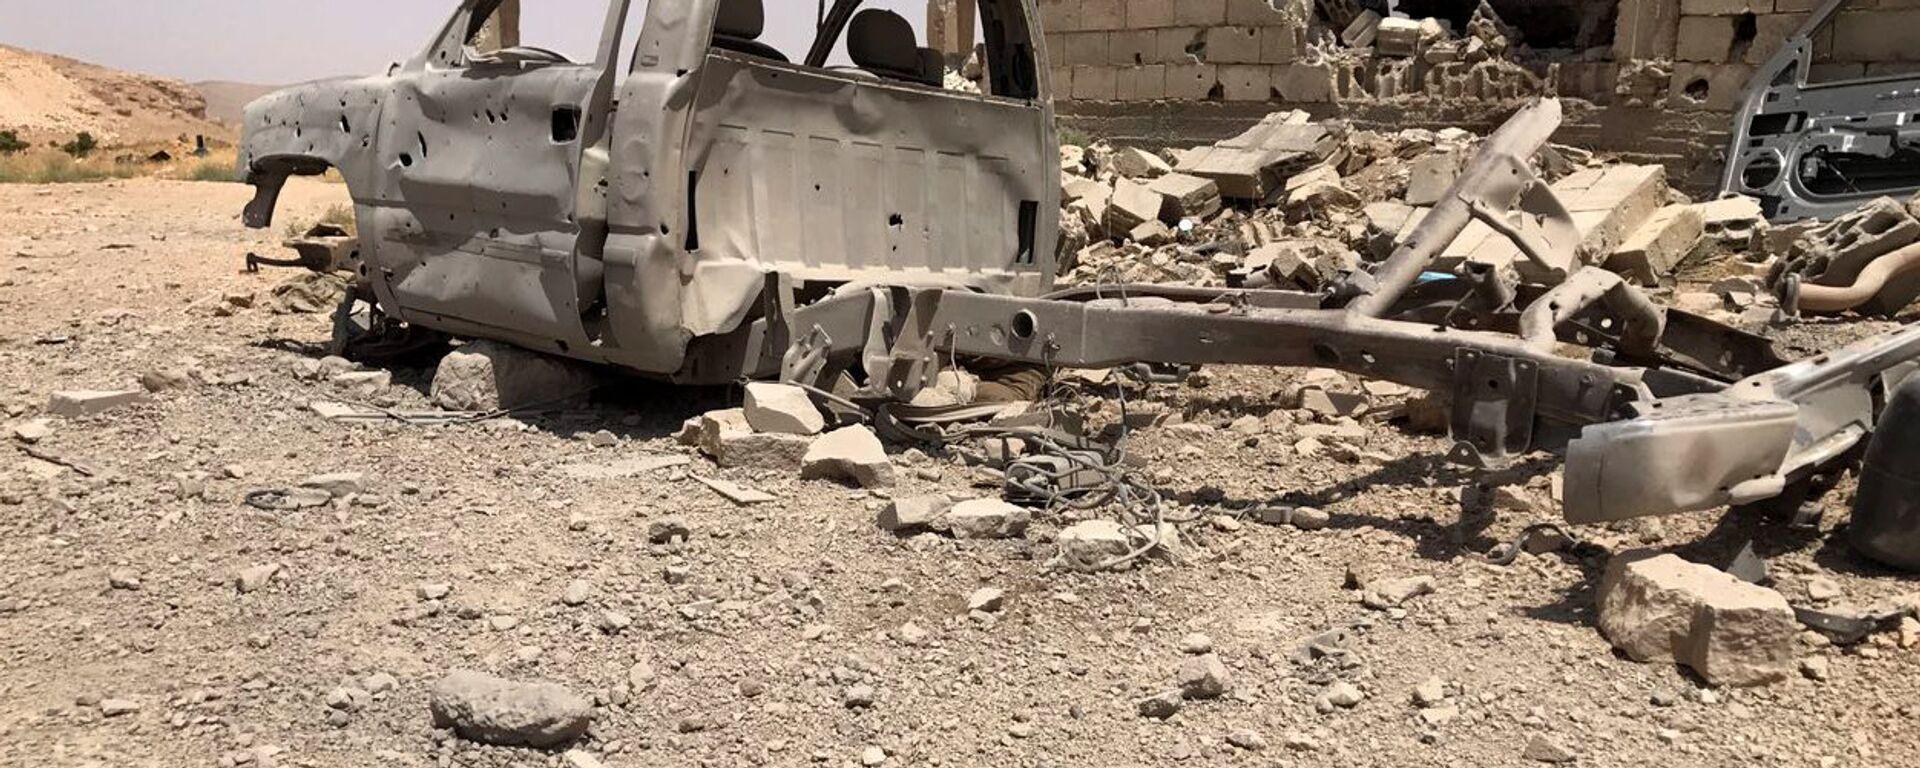 Una base destruida de los terroristas de Frente Al Nusra (archivo) - Sputnik Mundo, 1920, 31.05.2021